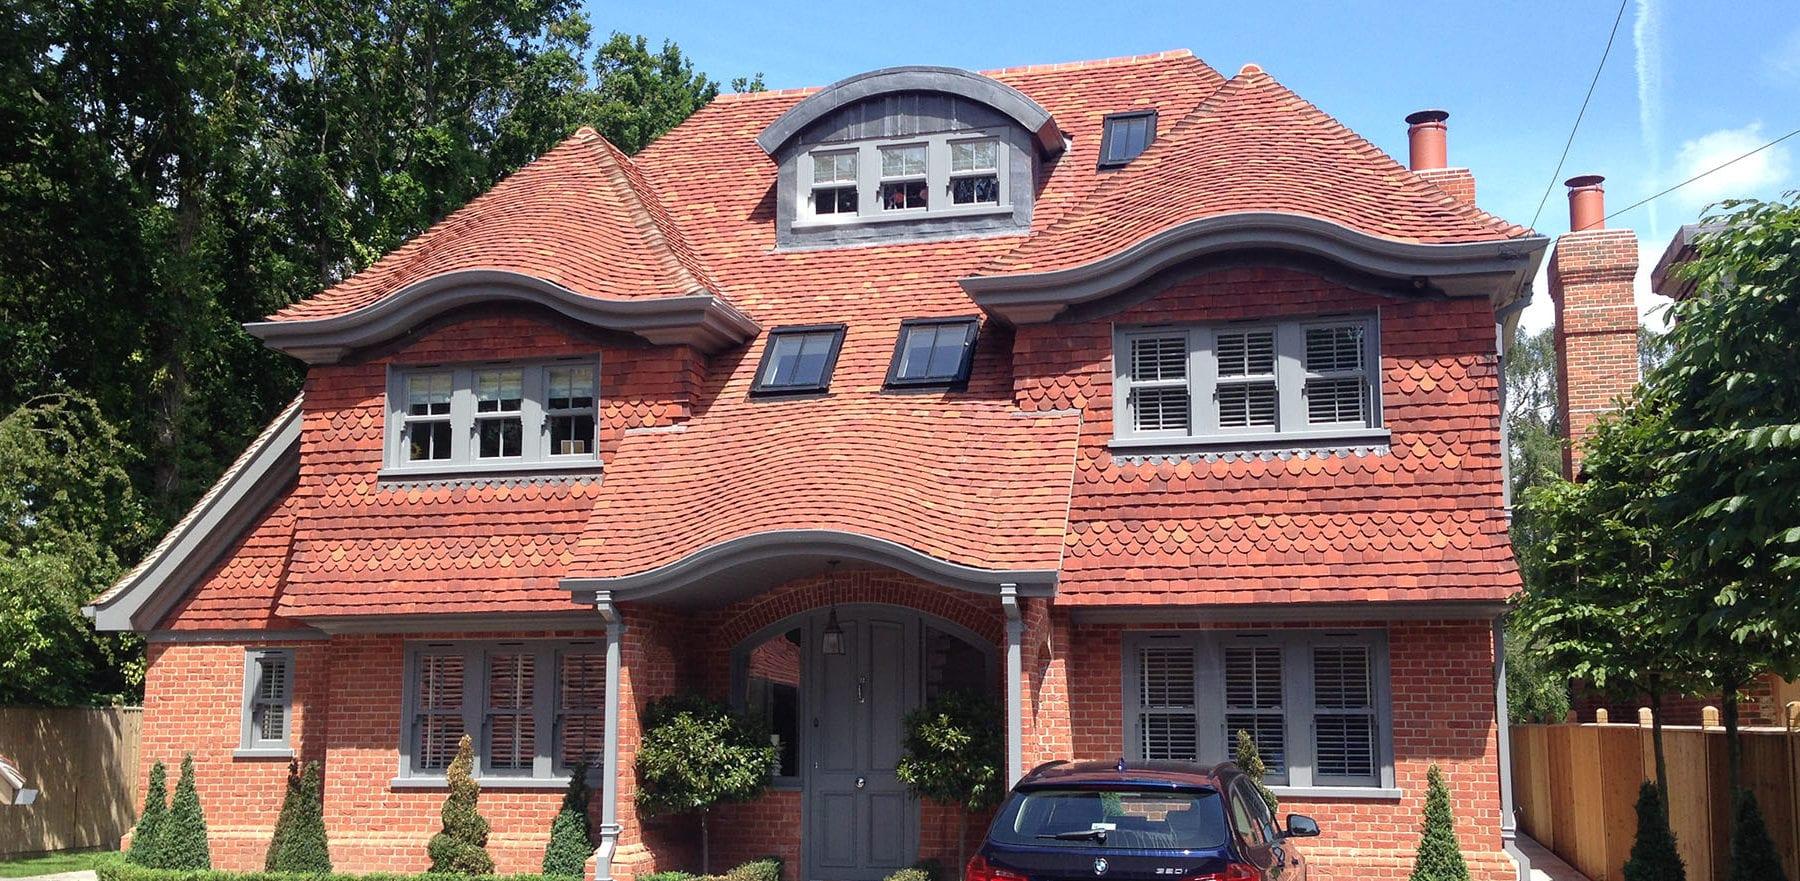 Lifestiles - Handmade Bespoke Clay Roof Tiles - Chichester, England